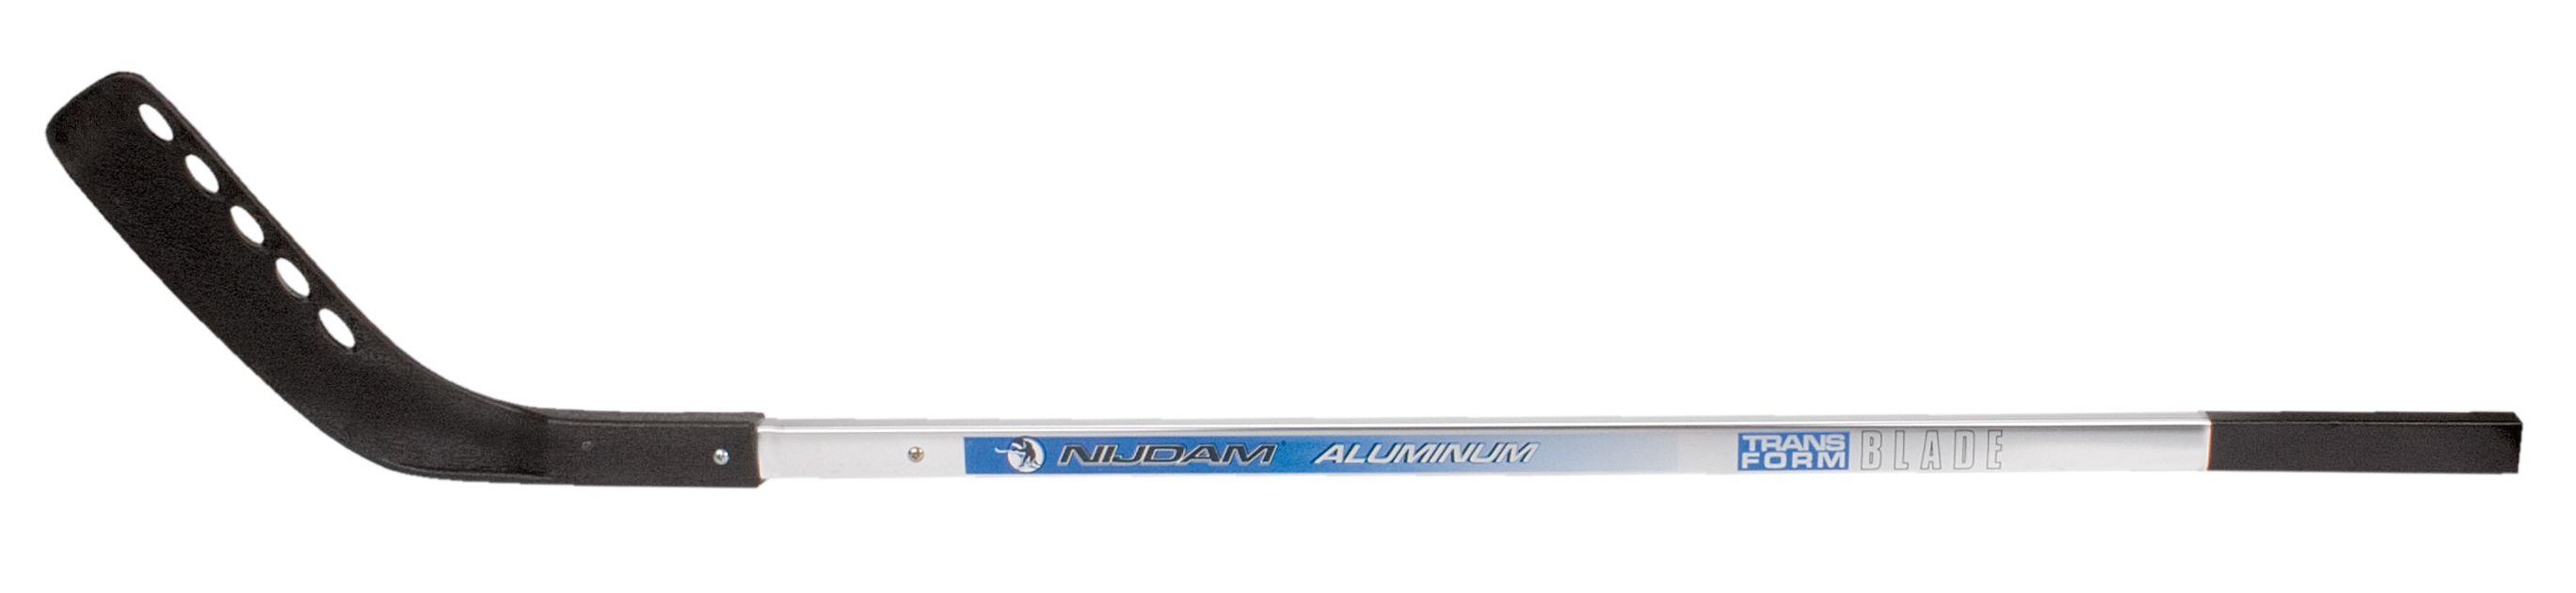 IJshockeystick Aluminium • 110 cm •